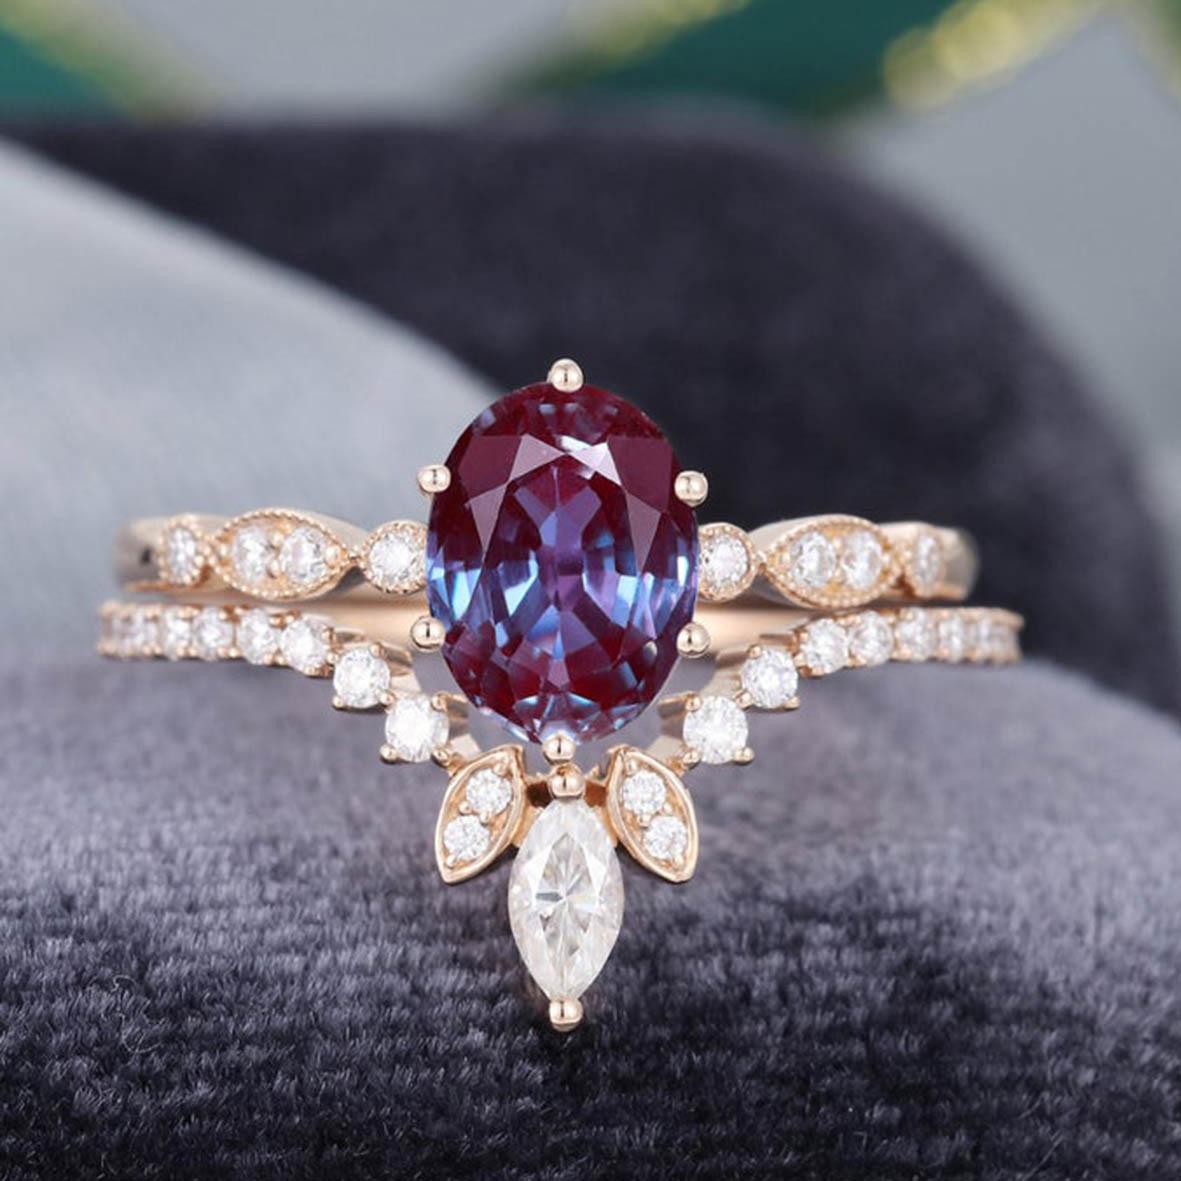 925 Sterling Silver CZ Dainty Jewelry Alexandrite Ring Set Alexandrite Wedding Rings